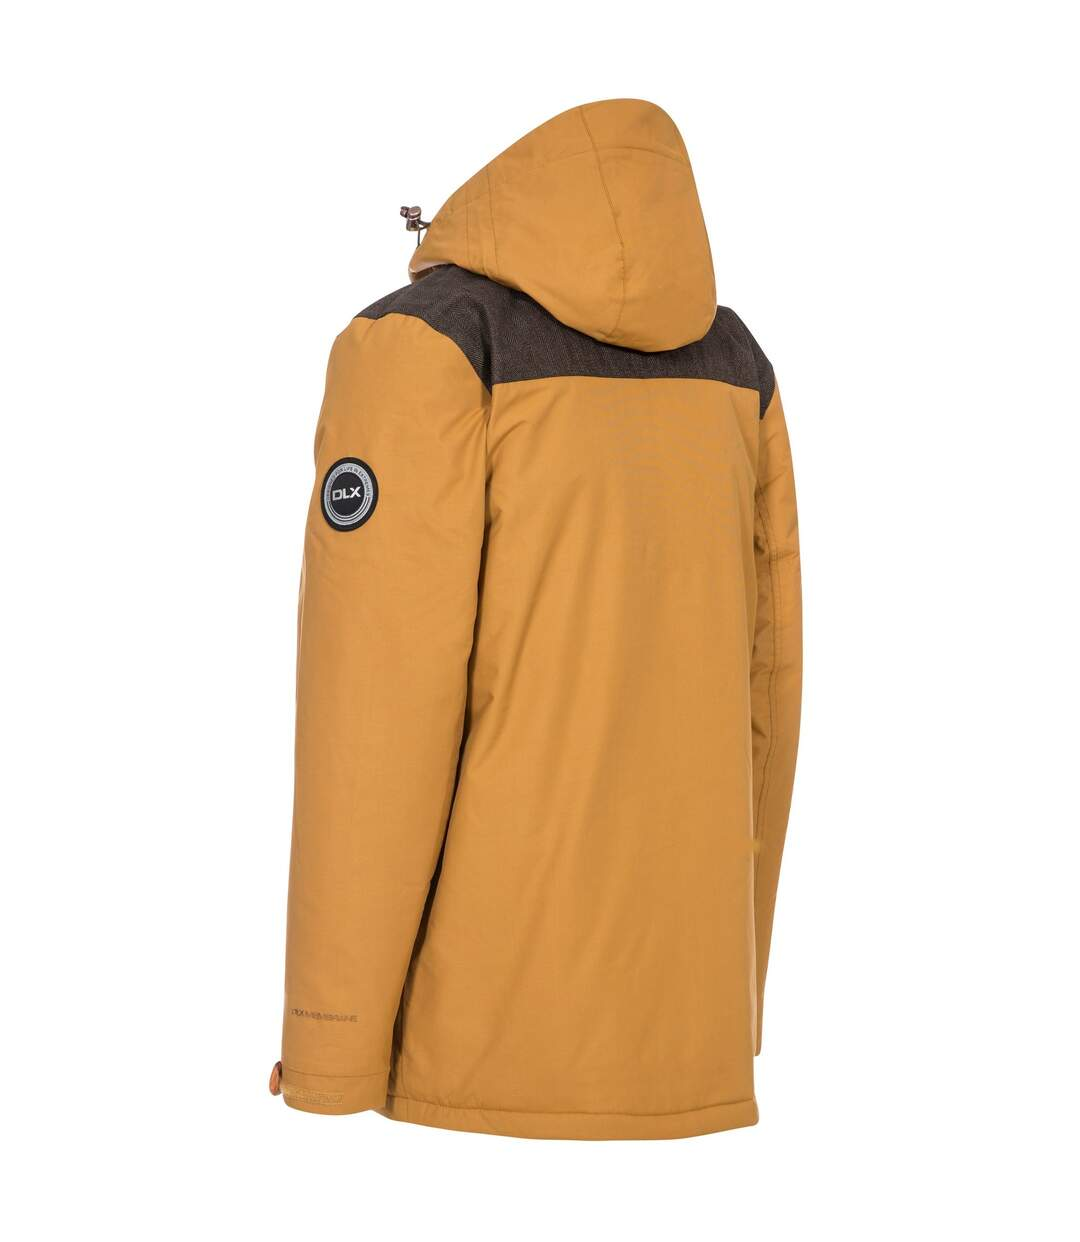 Trespass Mens Rockwell Waterproof Jacket (Sandstone) - UTTP4766